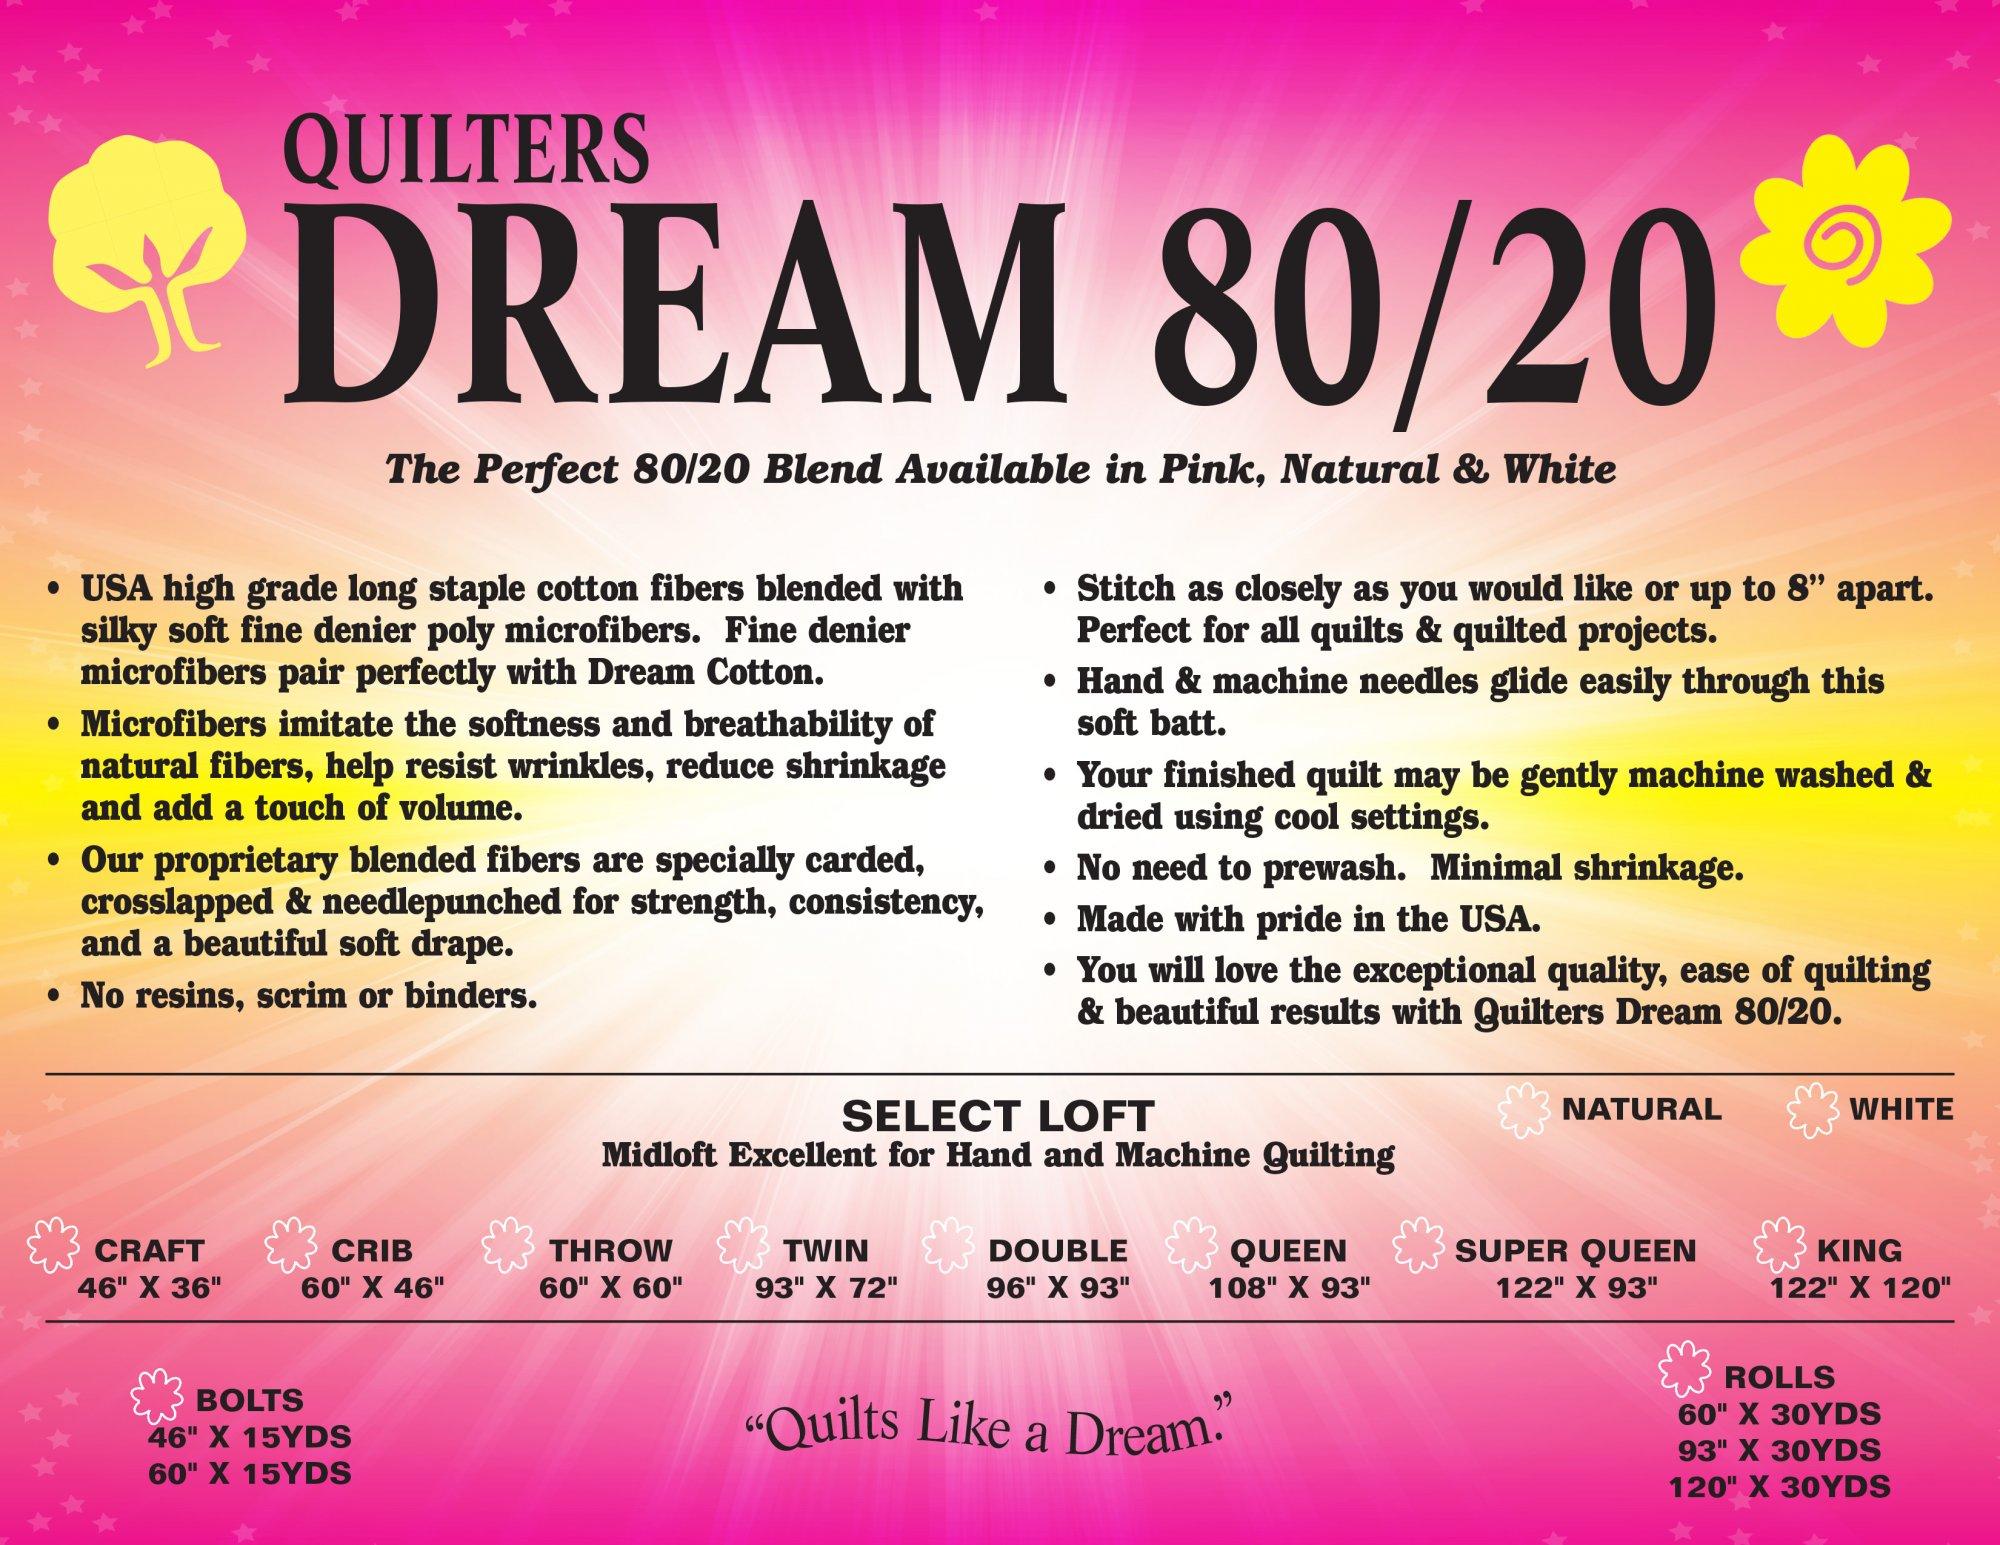 Dream 80/20 Natural Twin 93 x 72